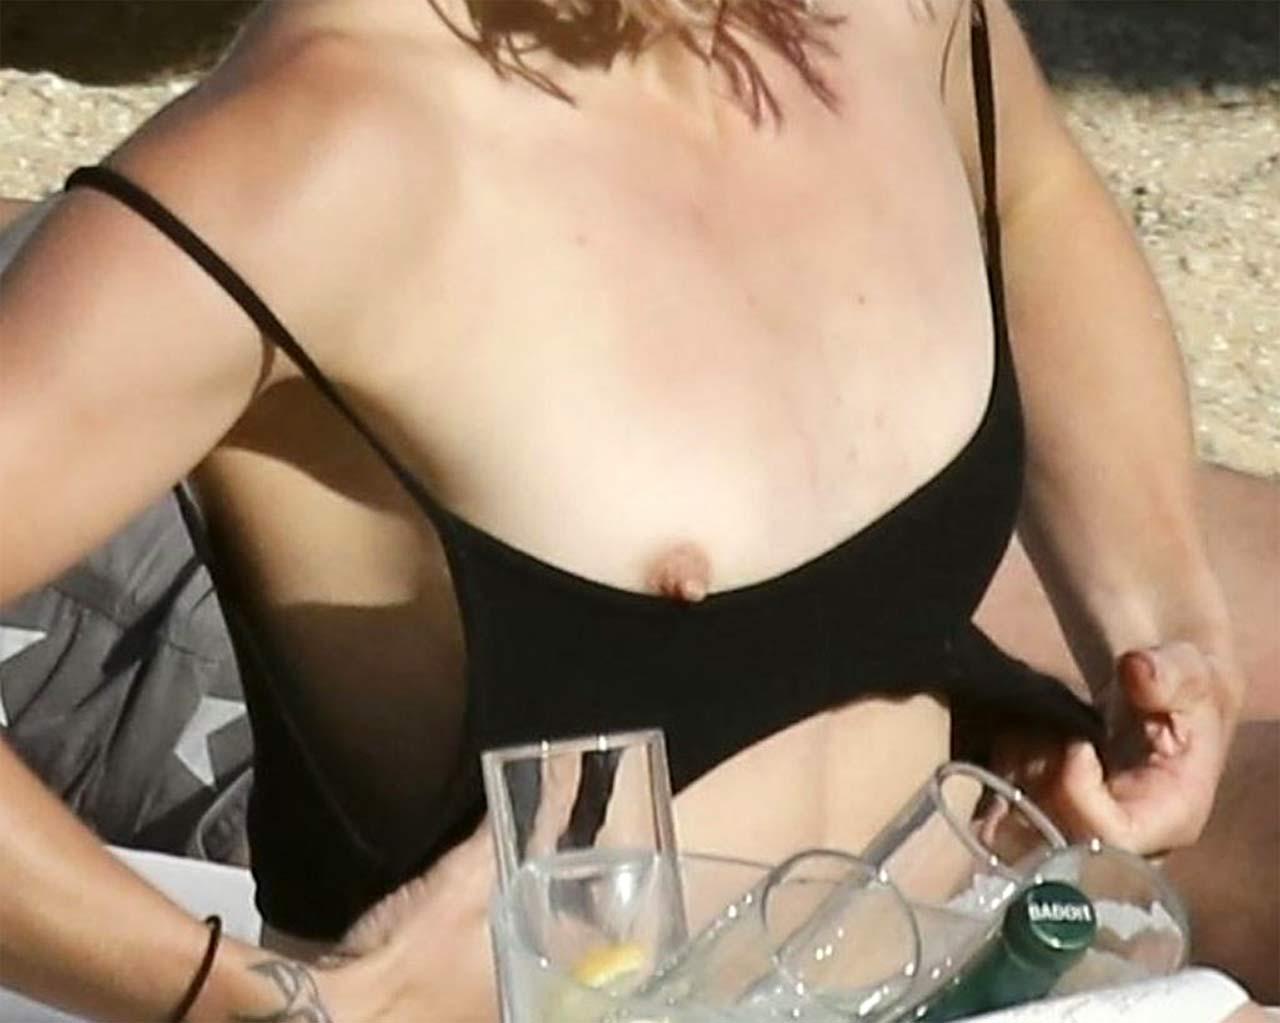 Stephanie Pratt Nude Tits at Candid Photos ! - Scandal Planet